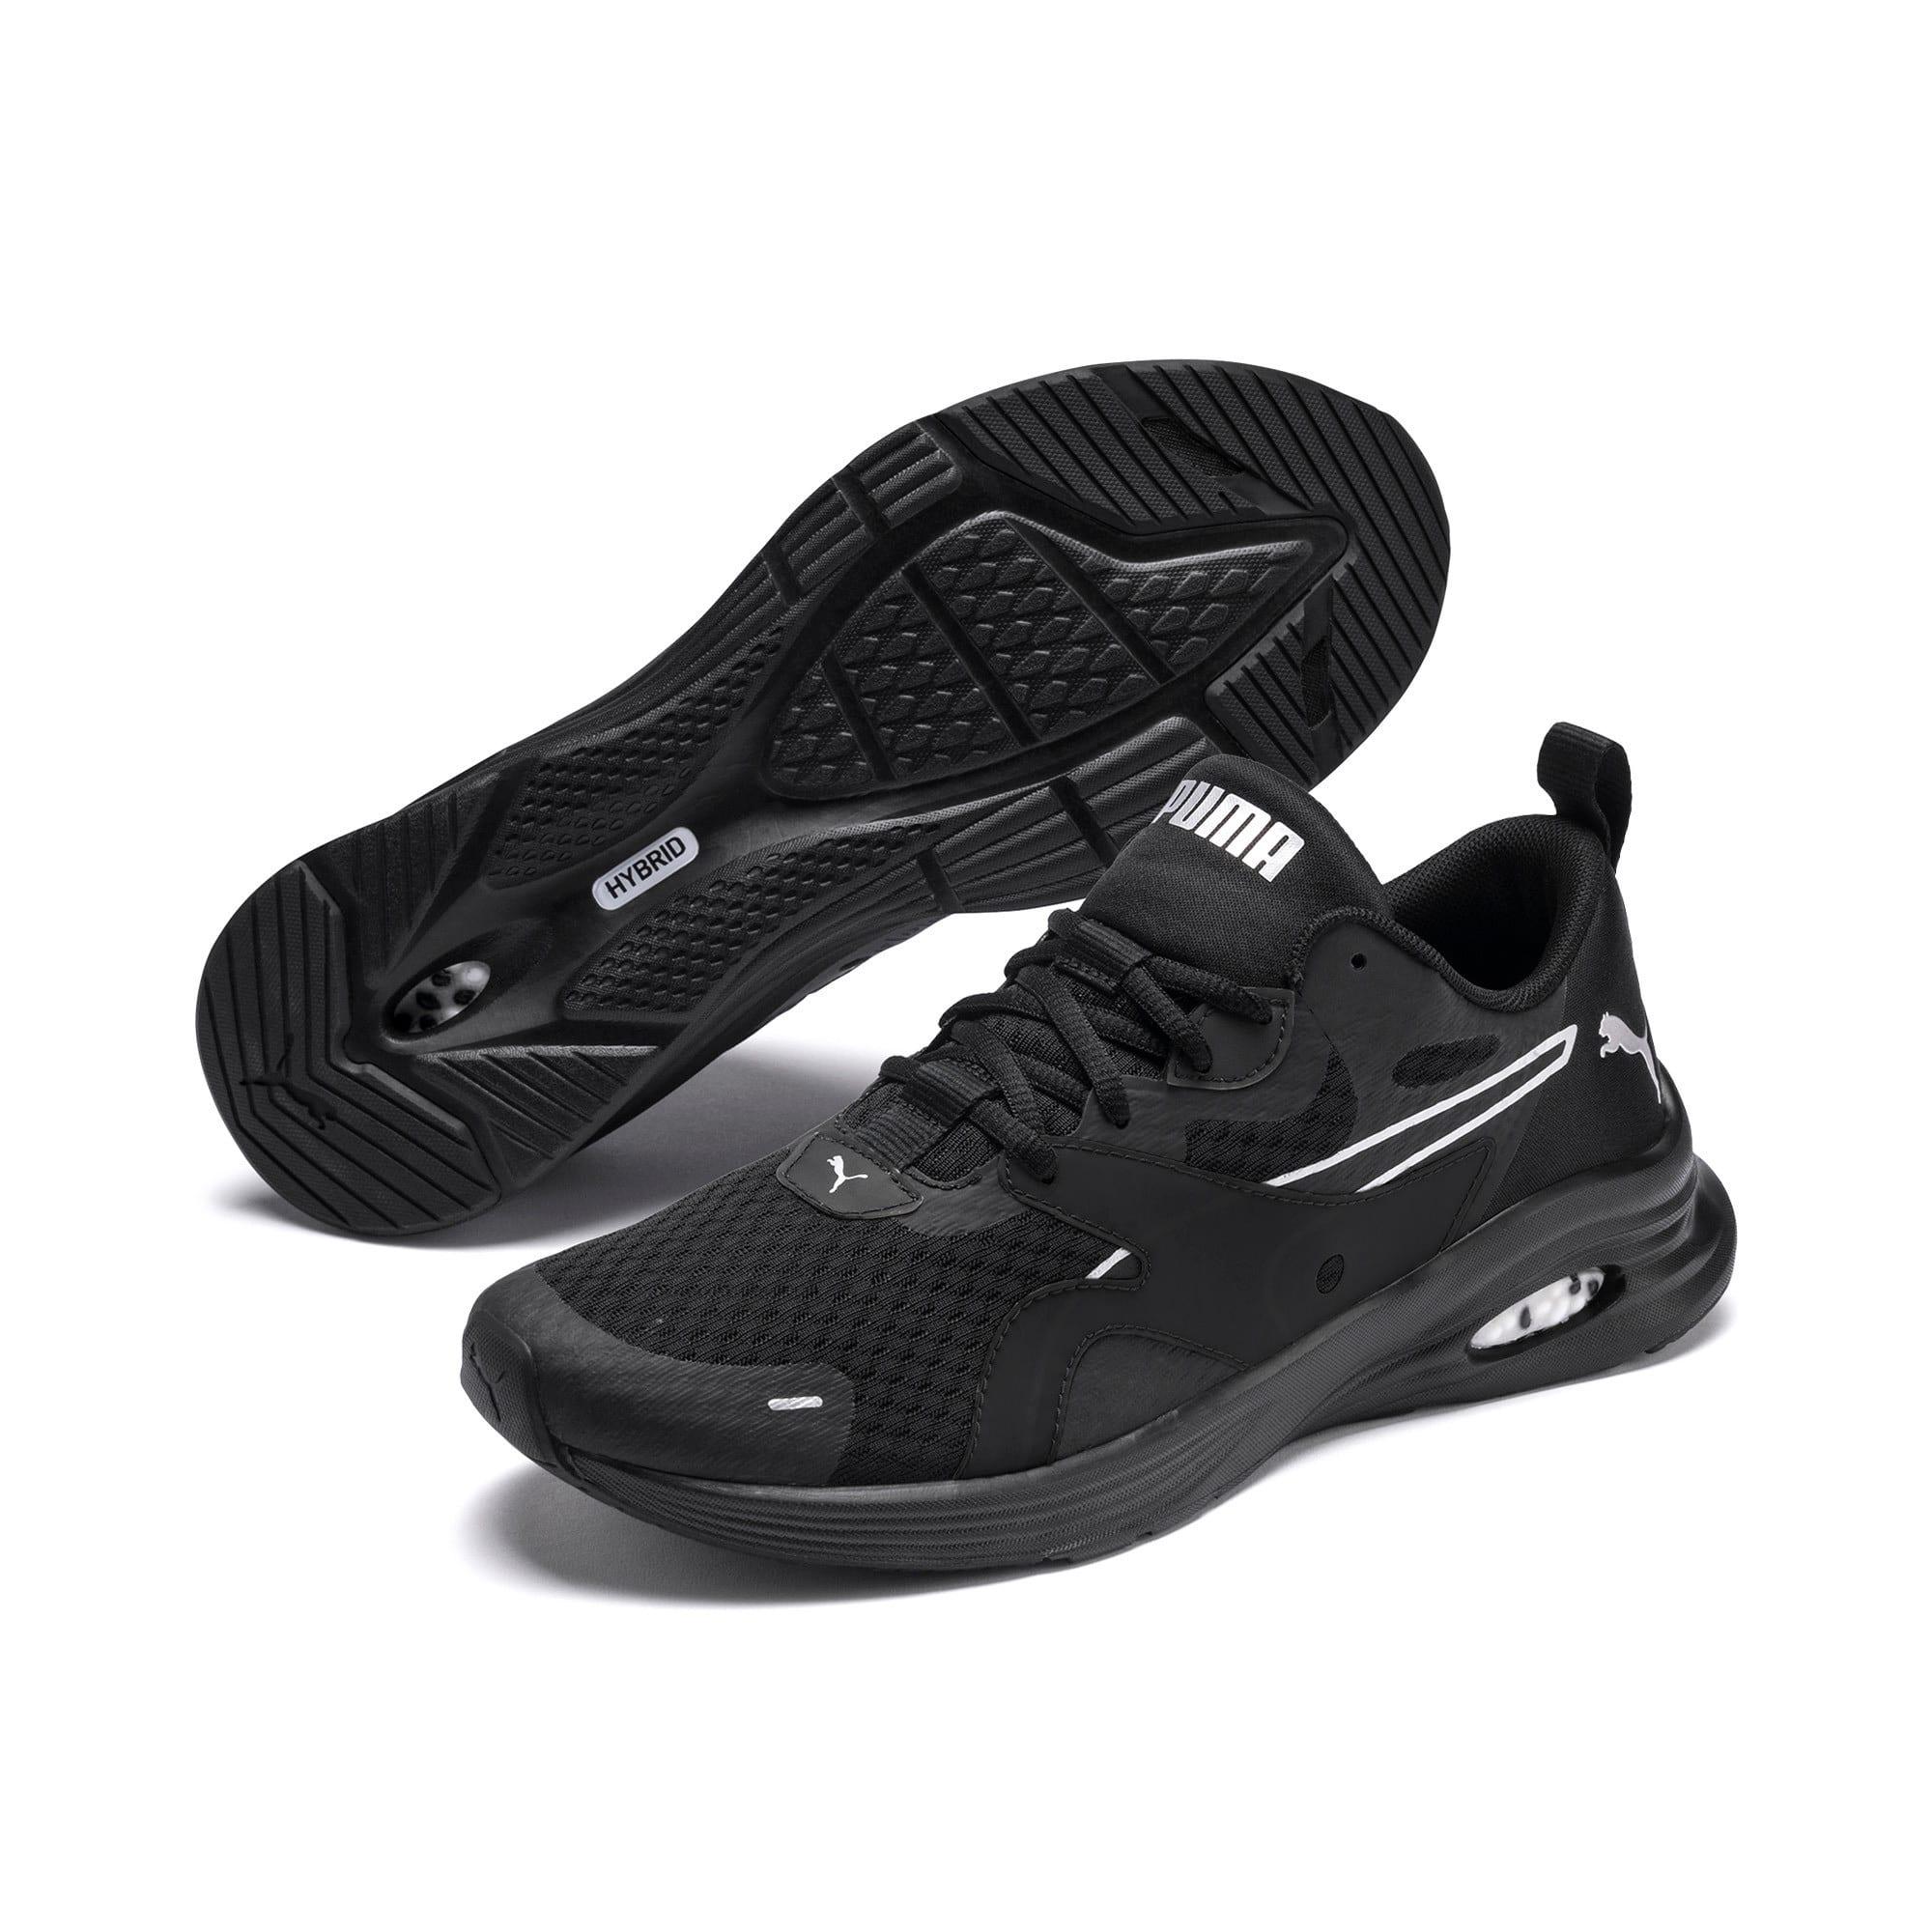 Thumbnail 3 of HYBRID Fuego Men's Running Shoes, Puma Black-Puma Black, medium